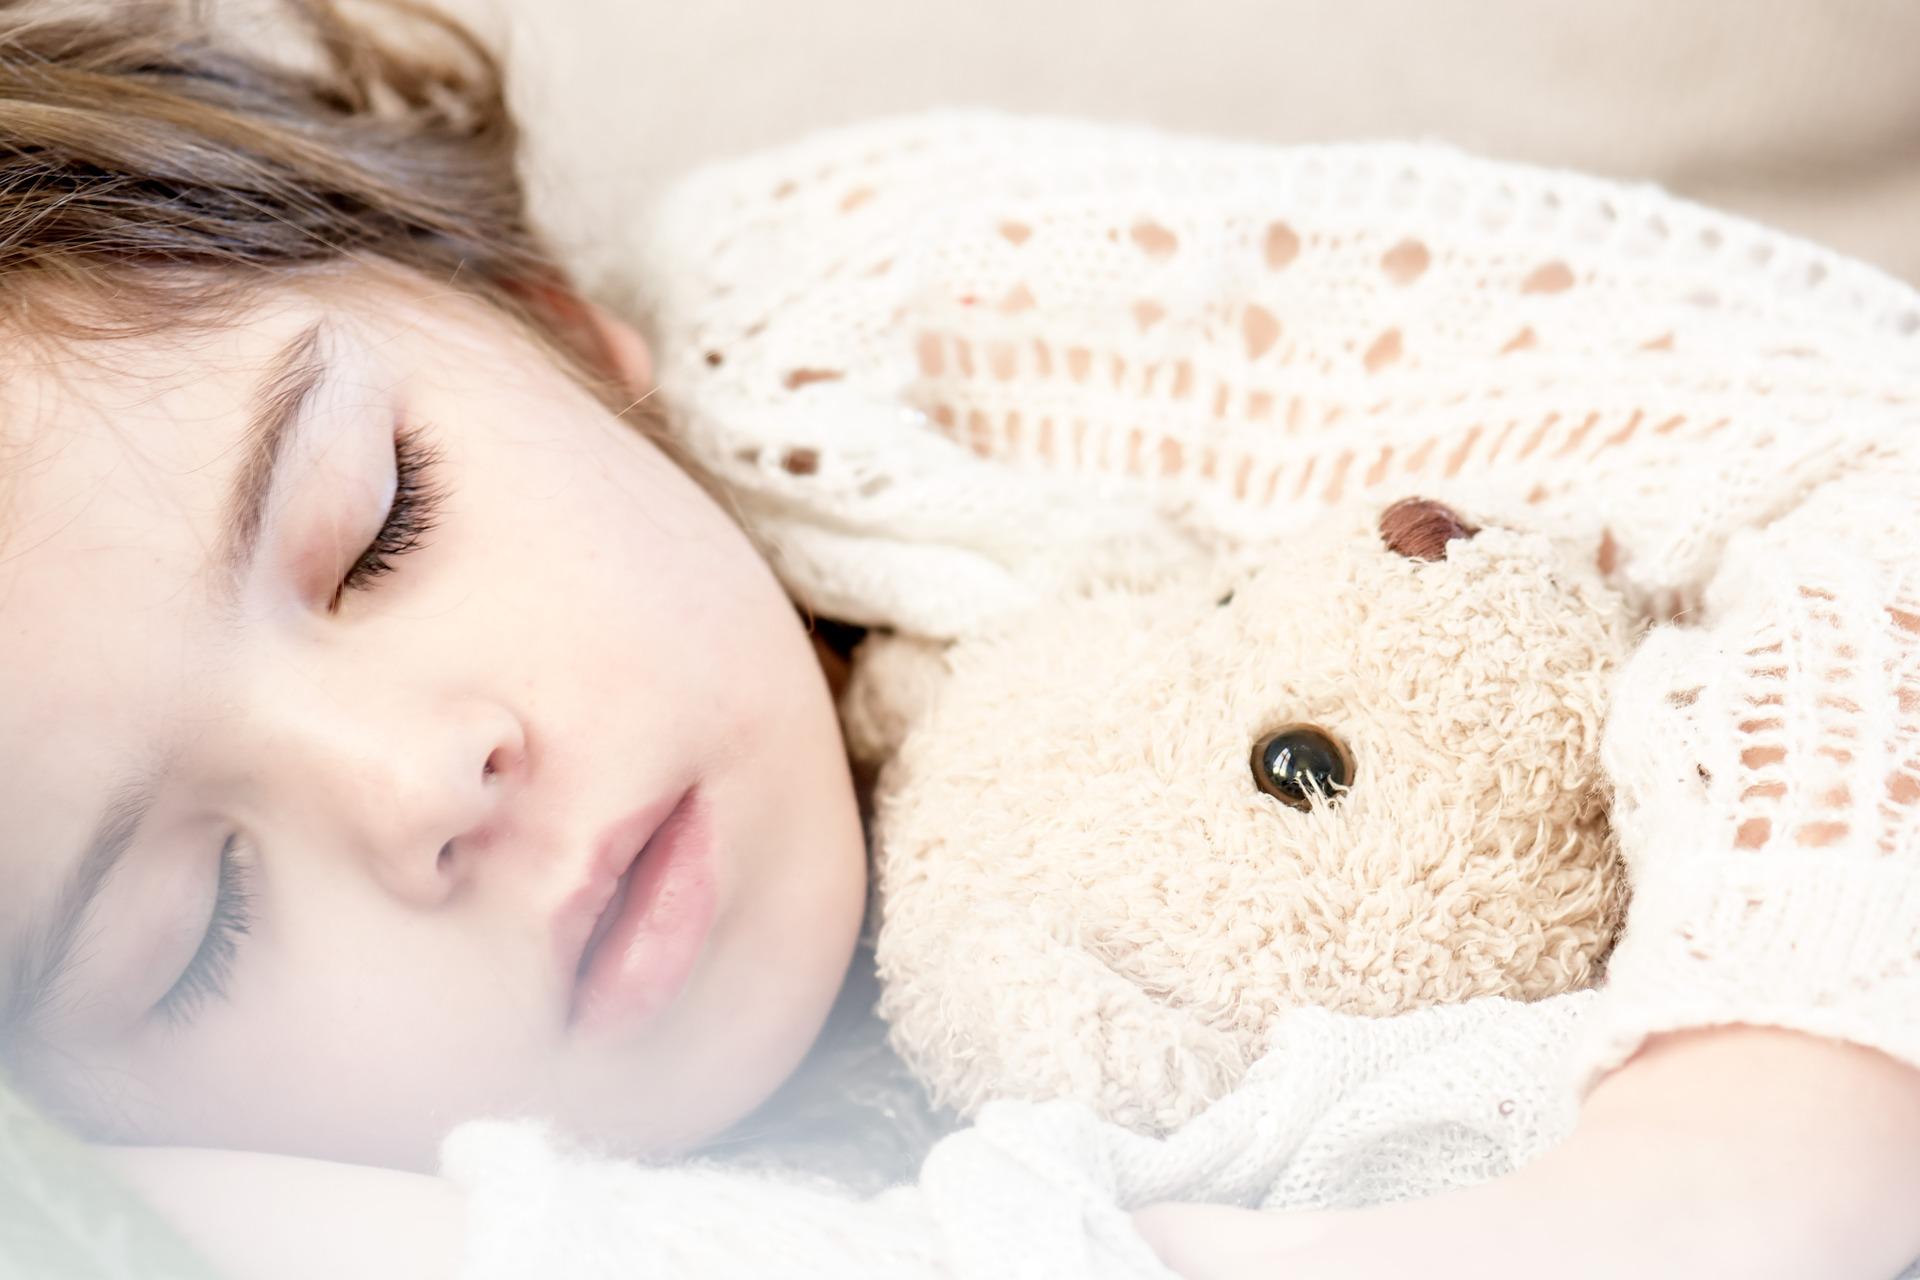 A child holding a teddy bear and sleeping.